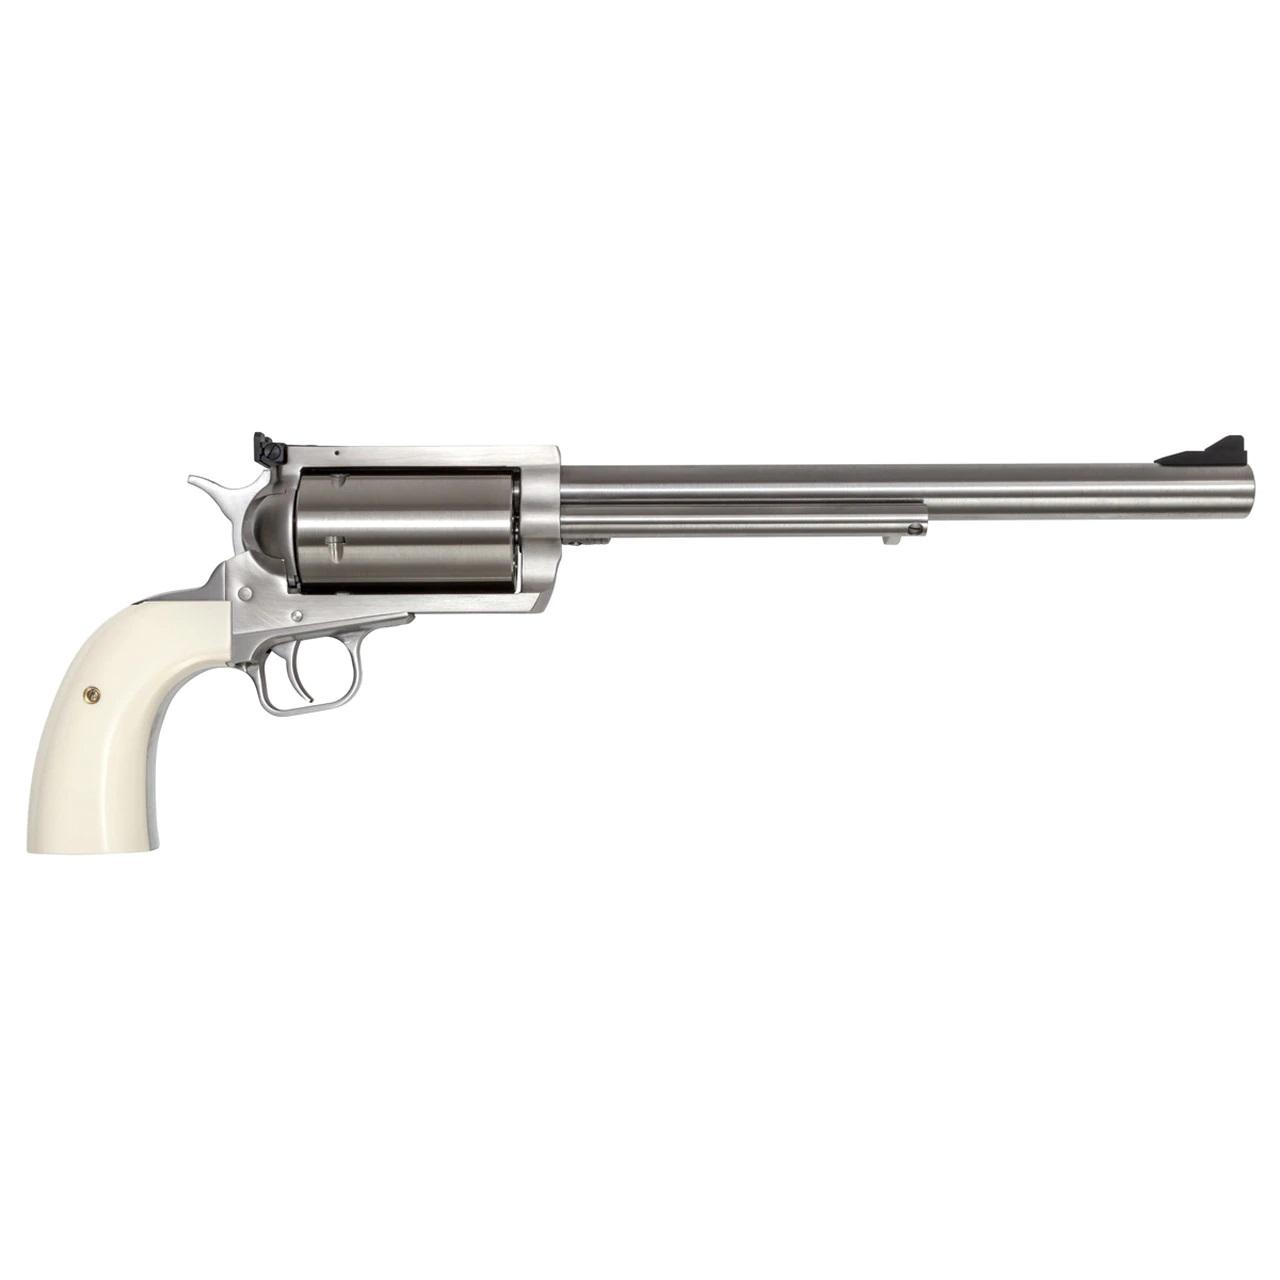 Magnum Research BFR Revolver 460 S&W Magnum